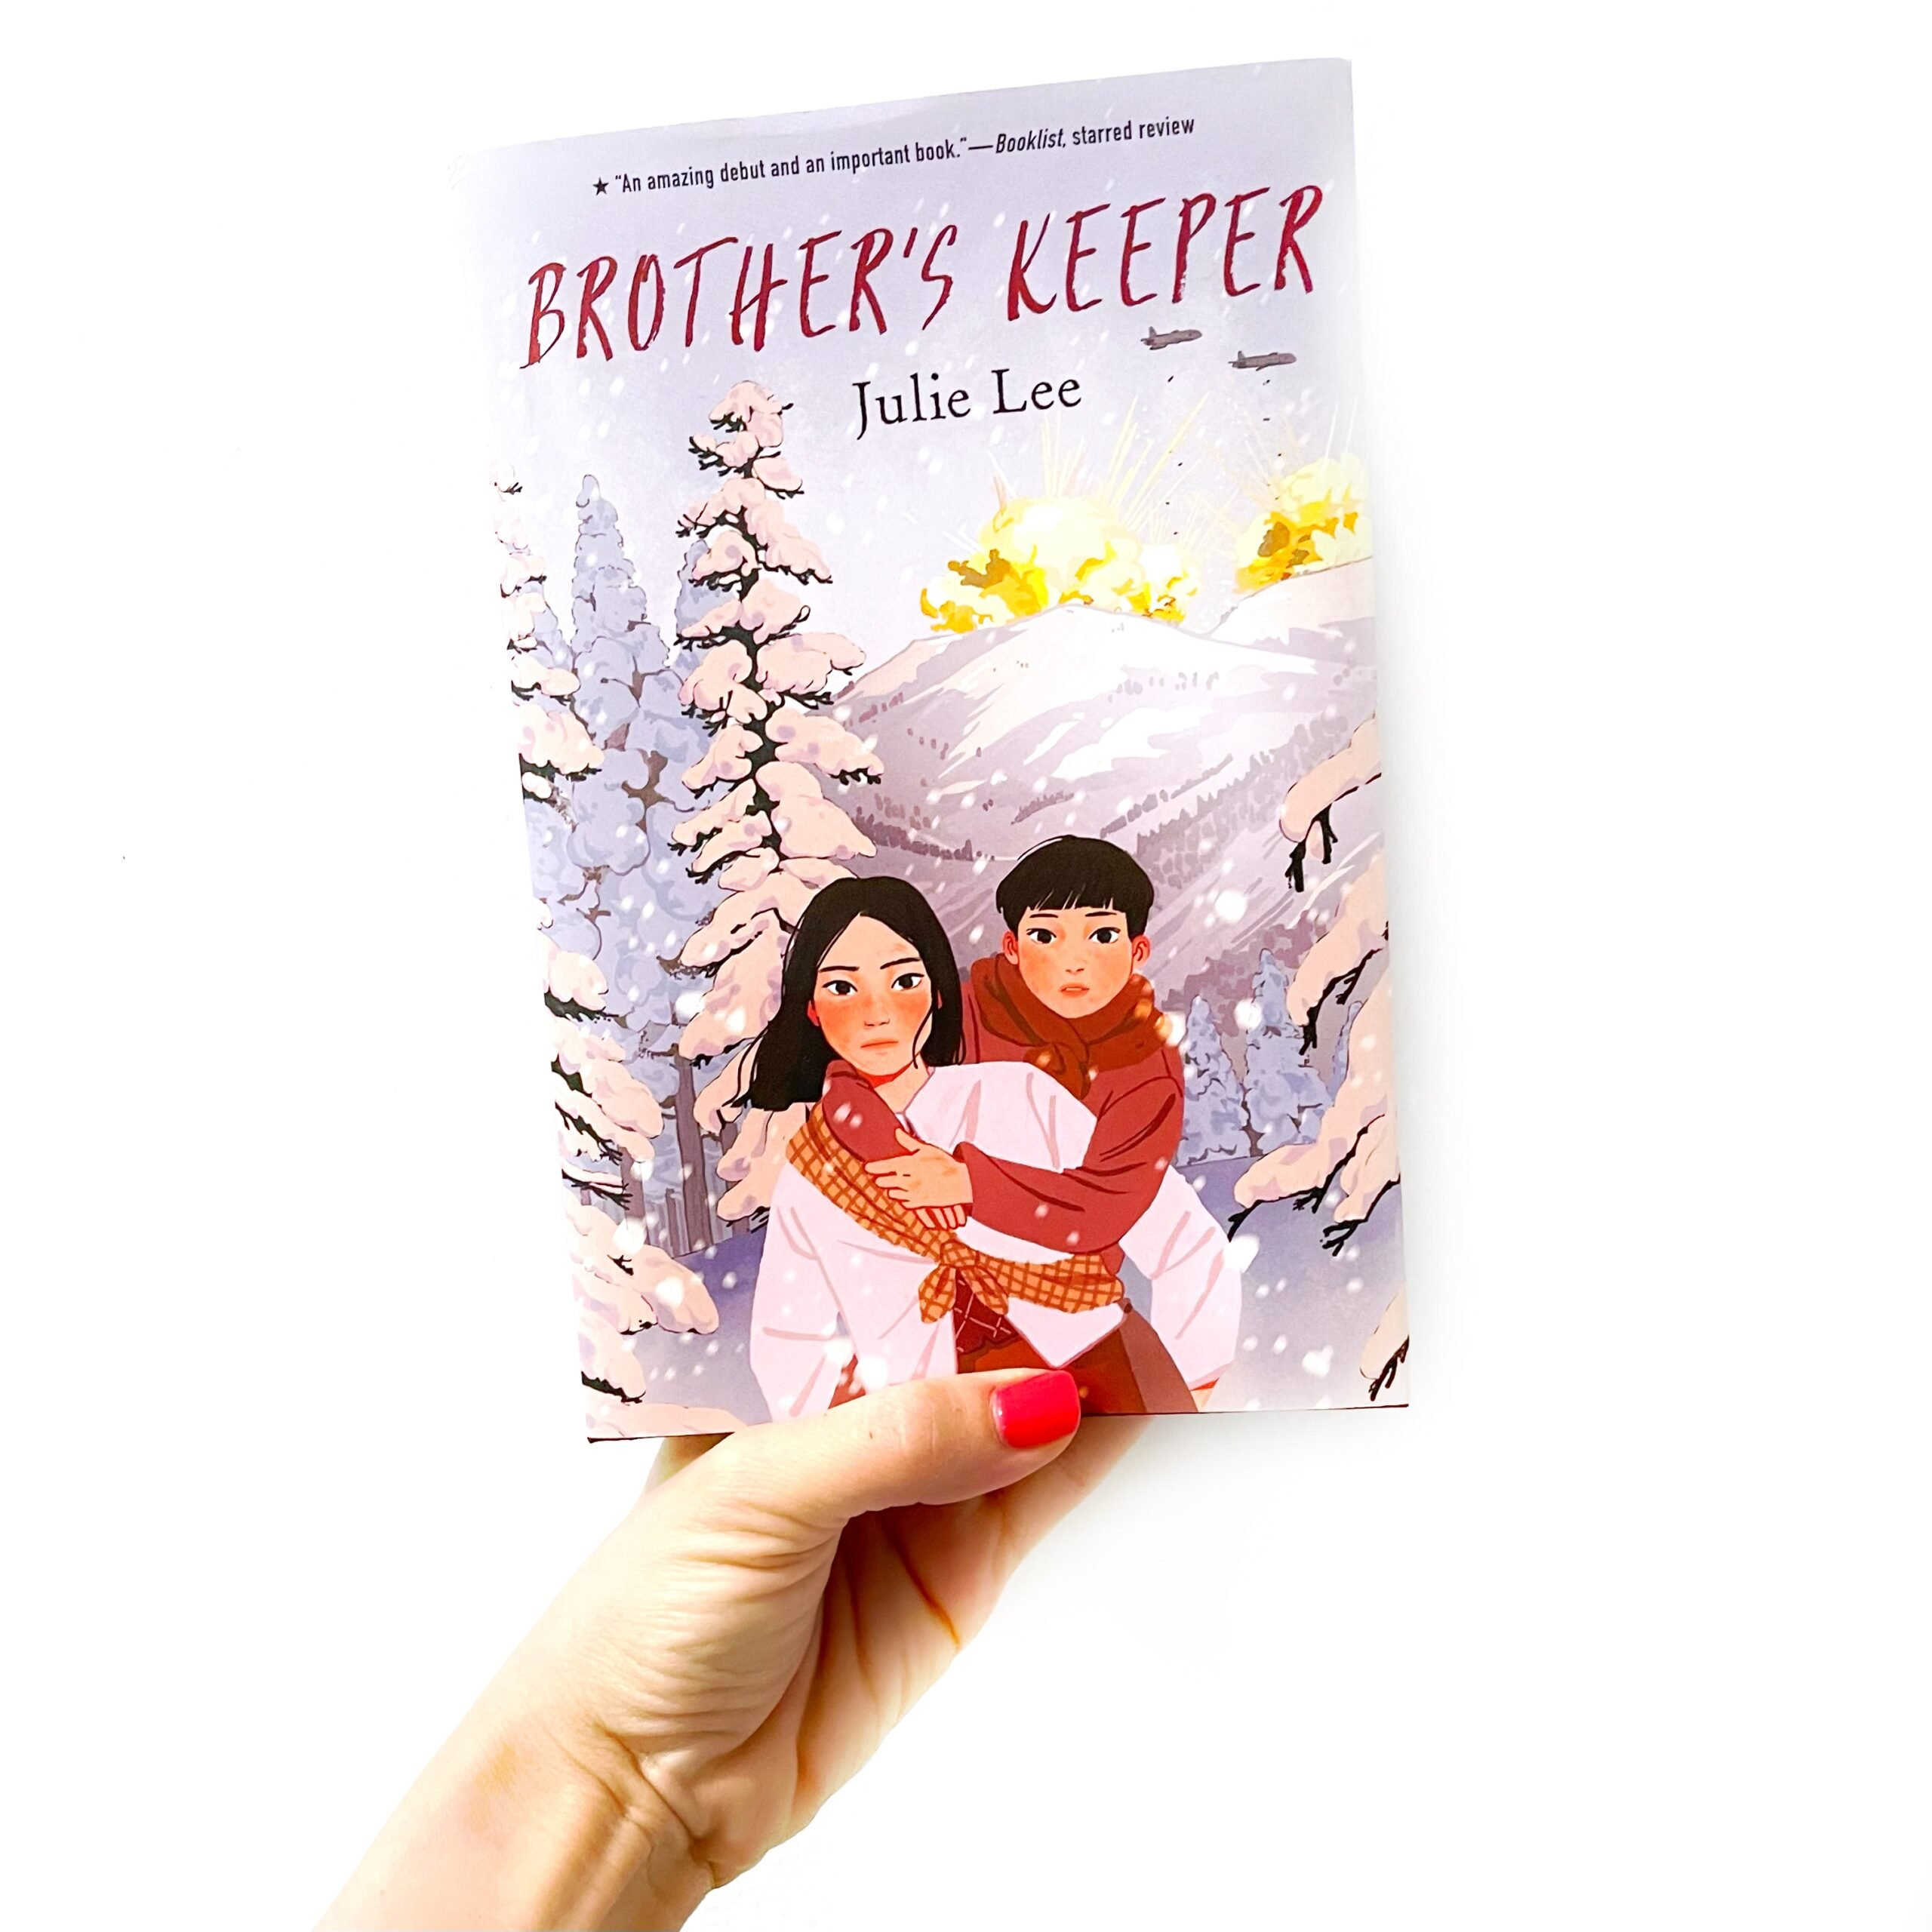 Brother's-keeper-julie-lee